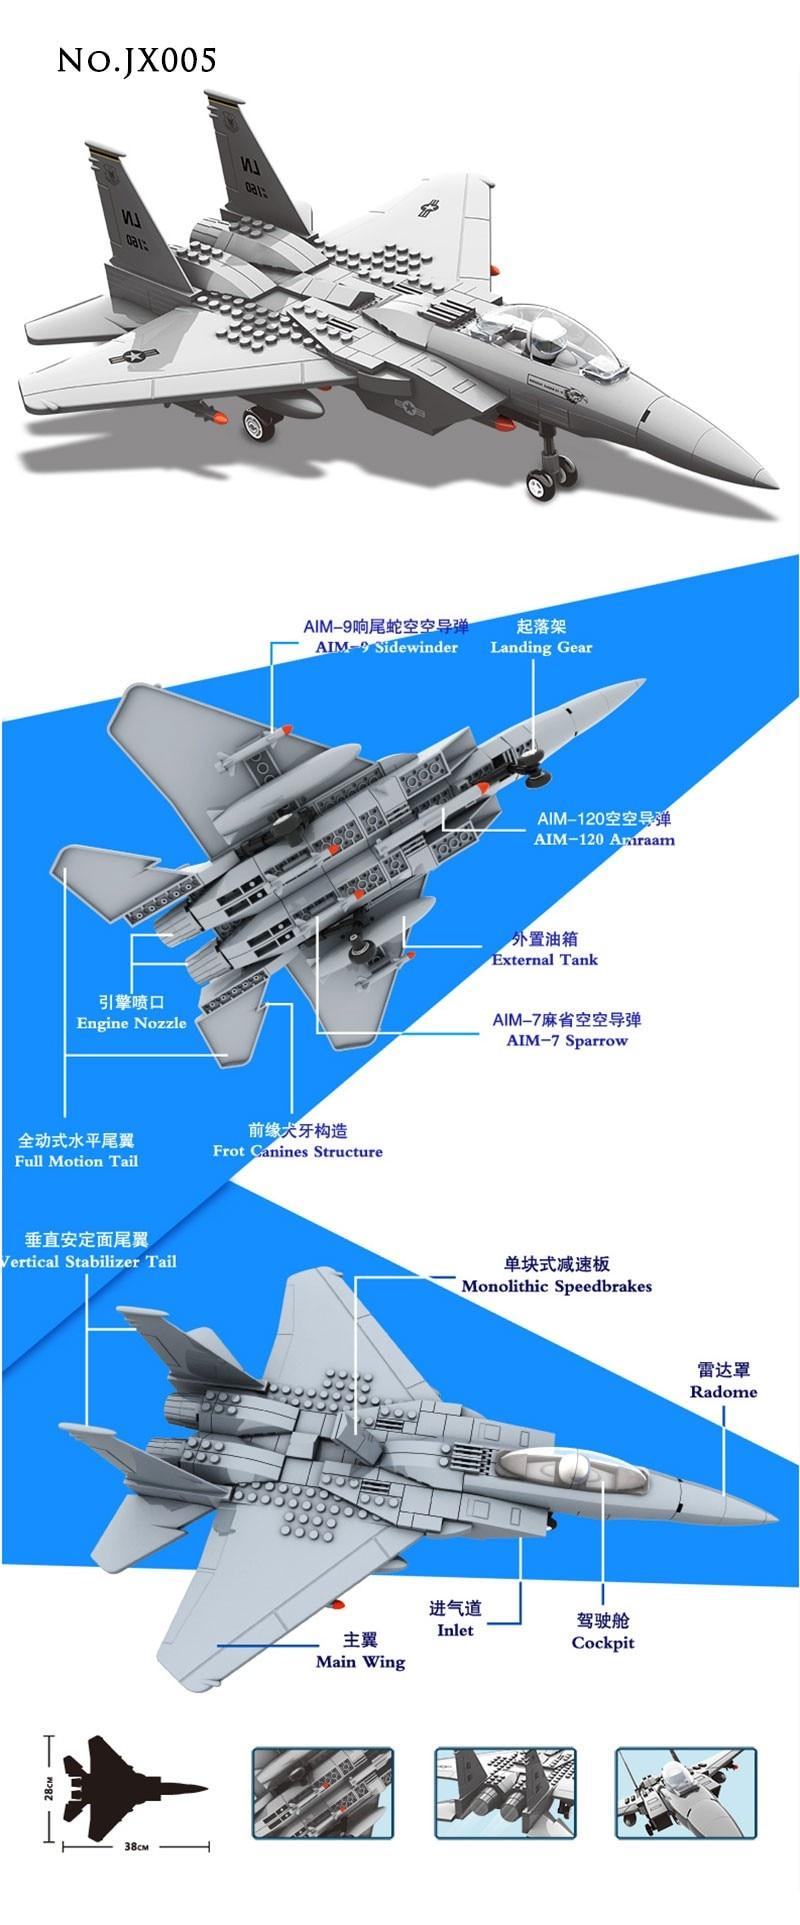 Wange Building Blocks Military F15 Fighter J-15 V-22 Osprey Tiltrotor Aircraft Helicopter Model Building Kits Toys For Children 5